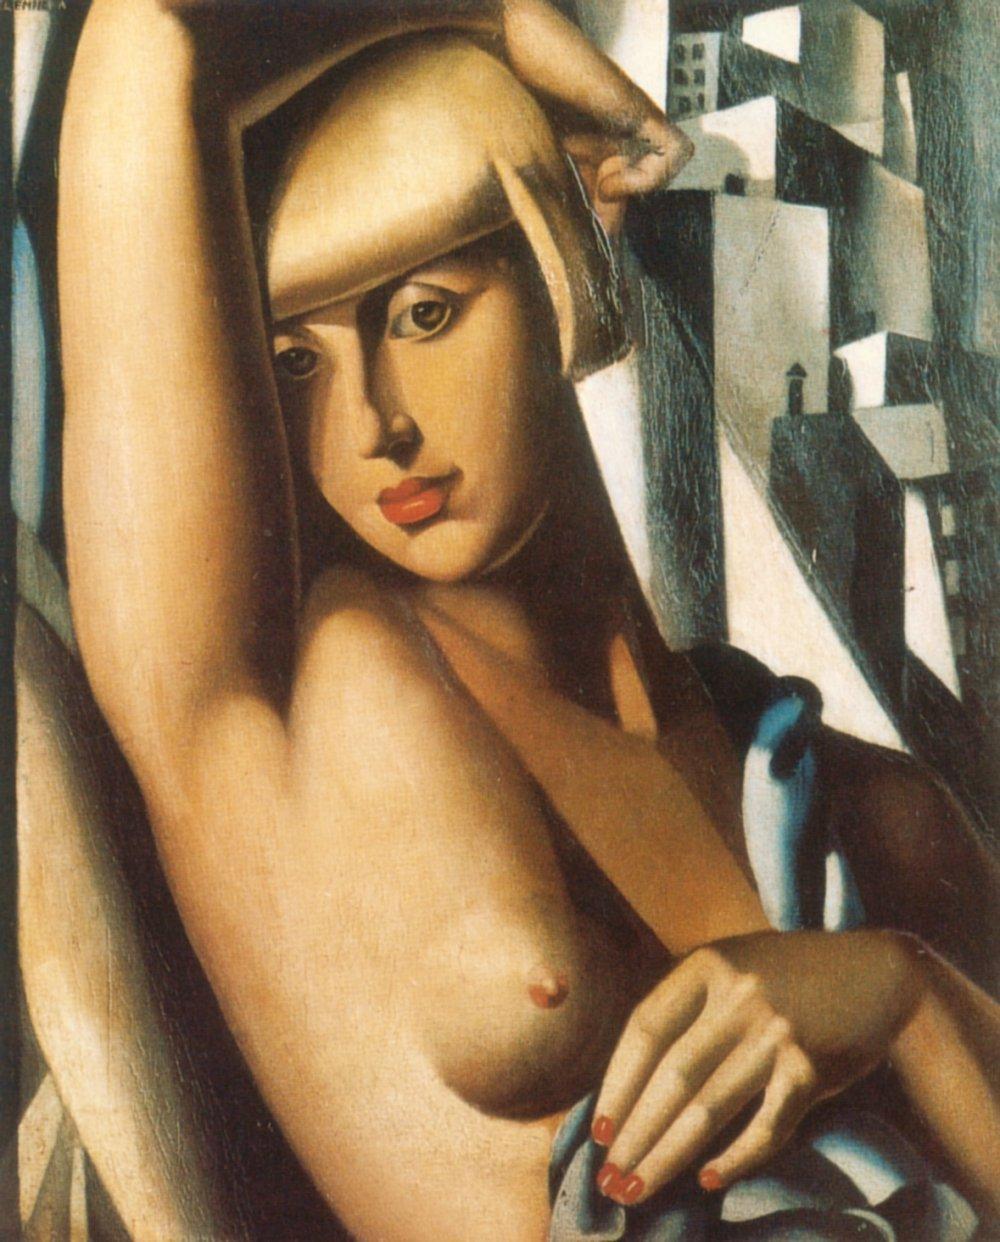 http://uploads0.wikipaintings.org/images/tamara-de-lempicka/portrait-of-suzy-solidor-1933.jpg